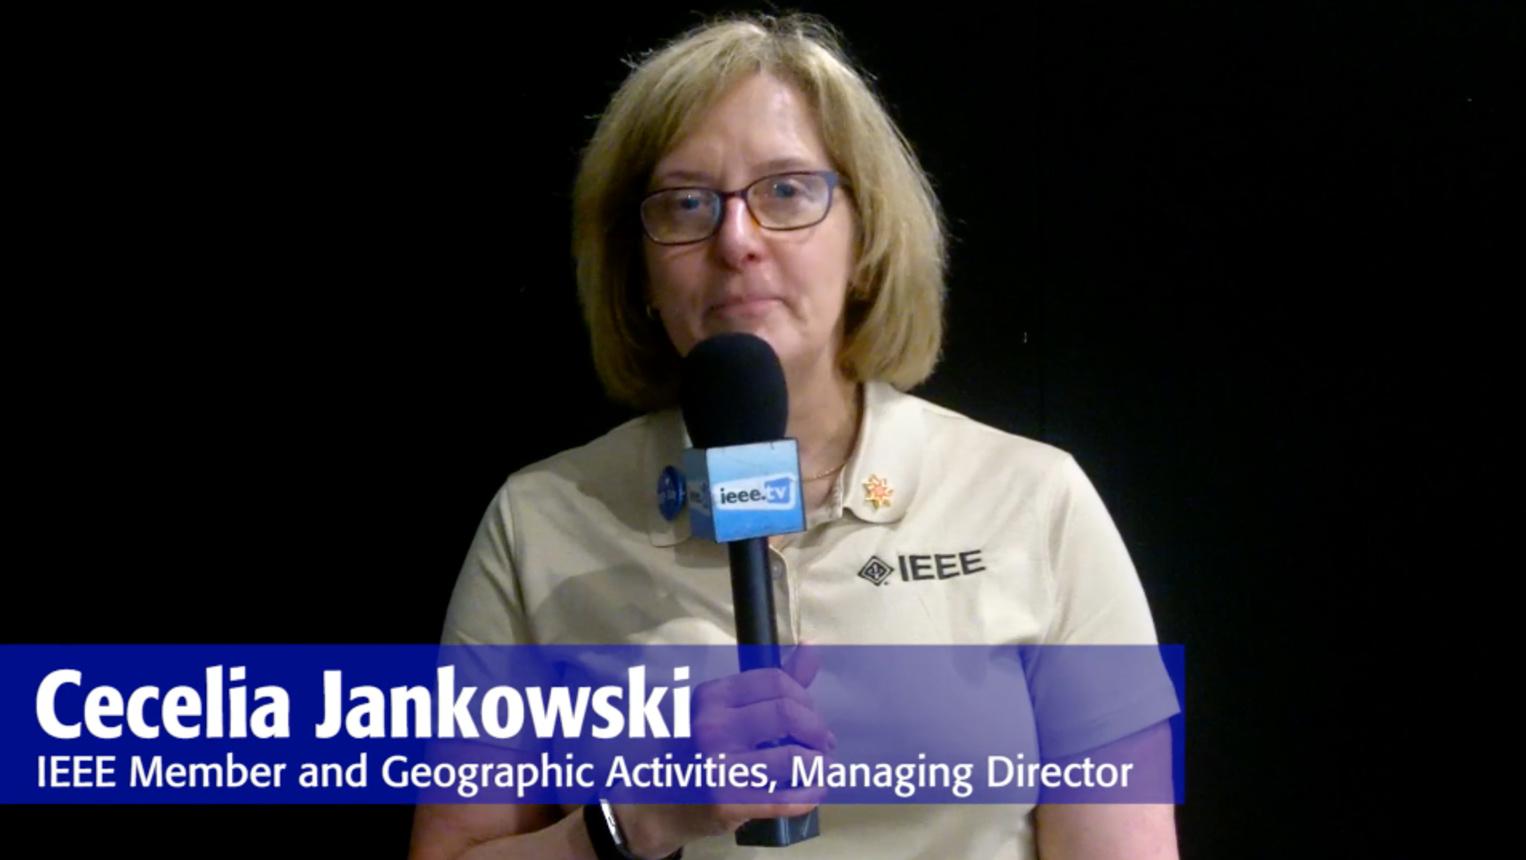 IEEE Day 2017 Testimonial: Cecelia Jankowski